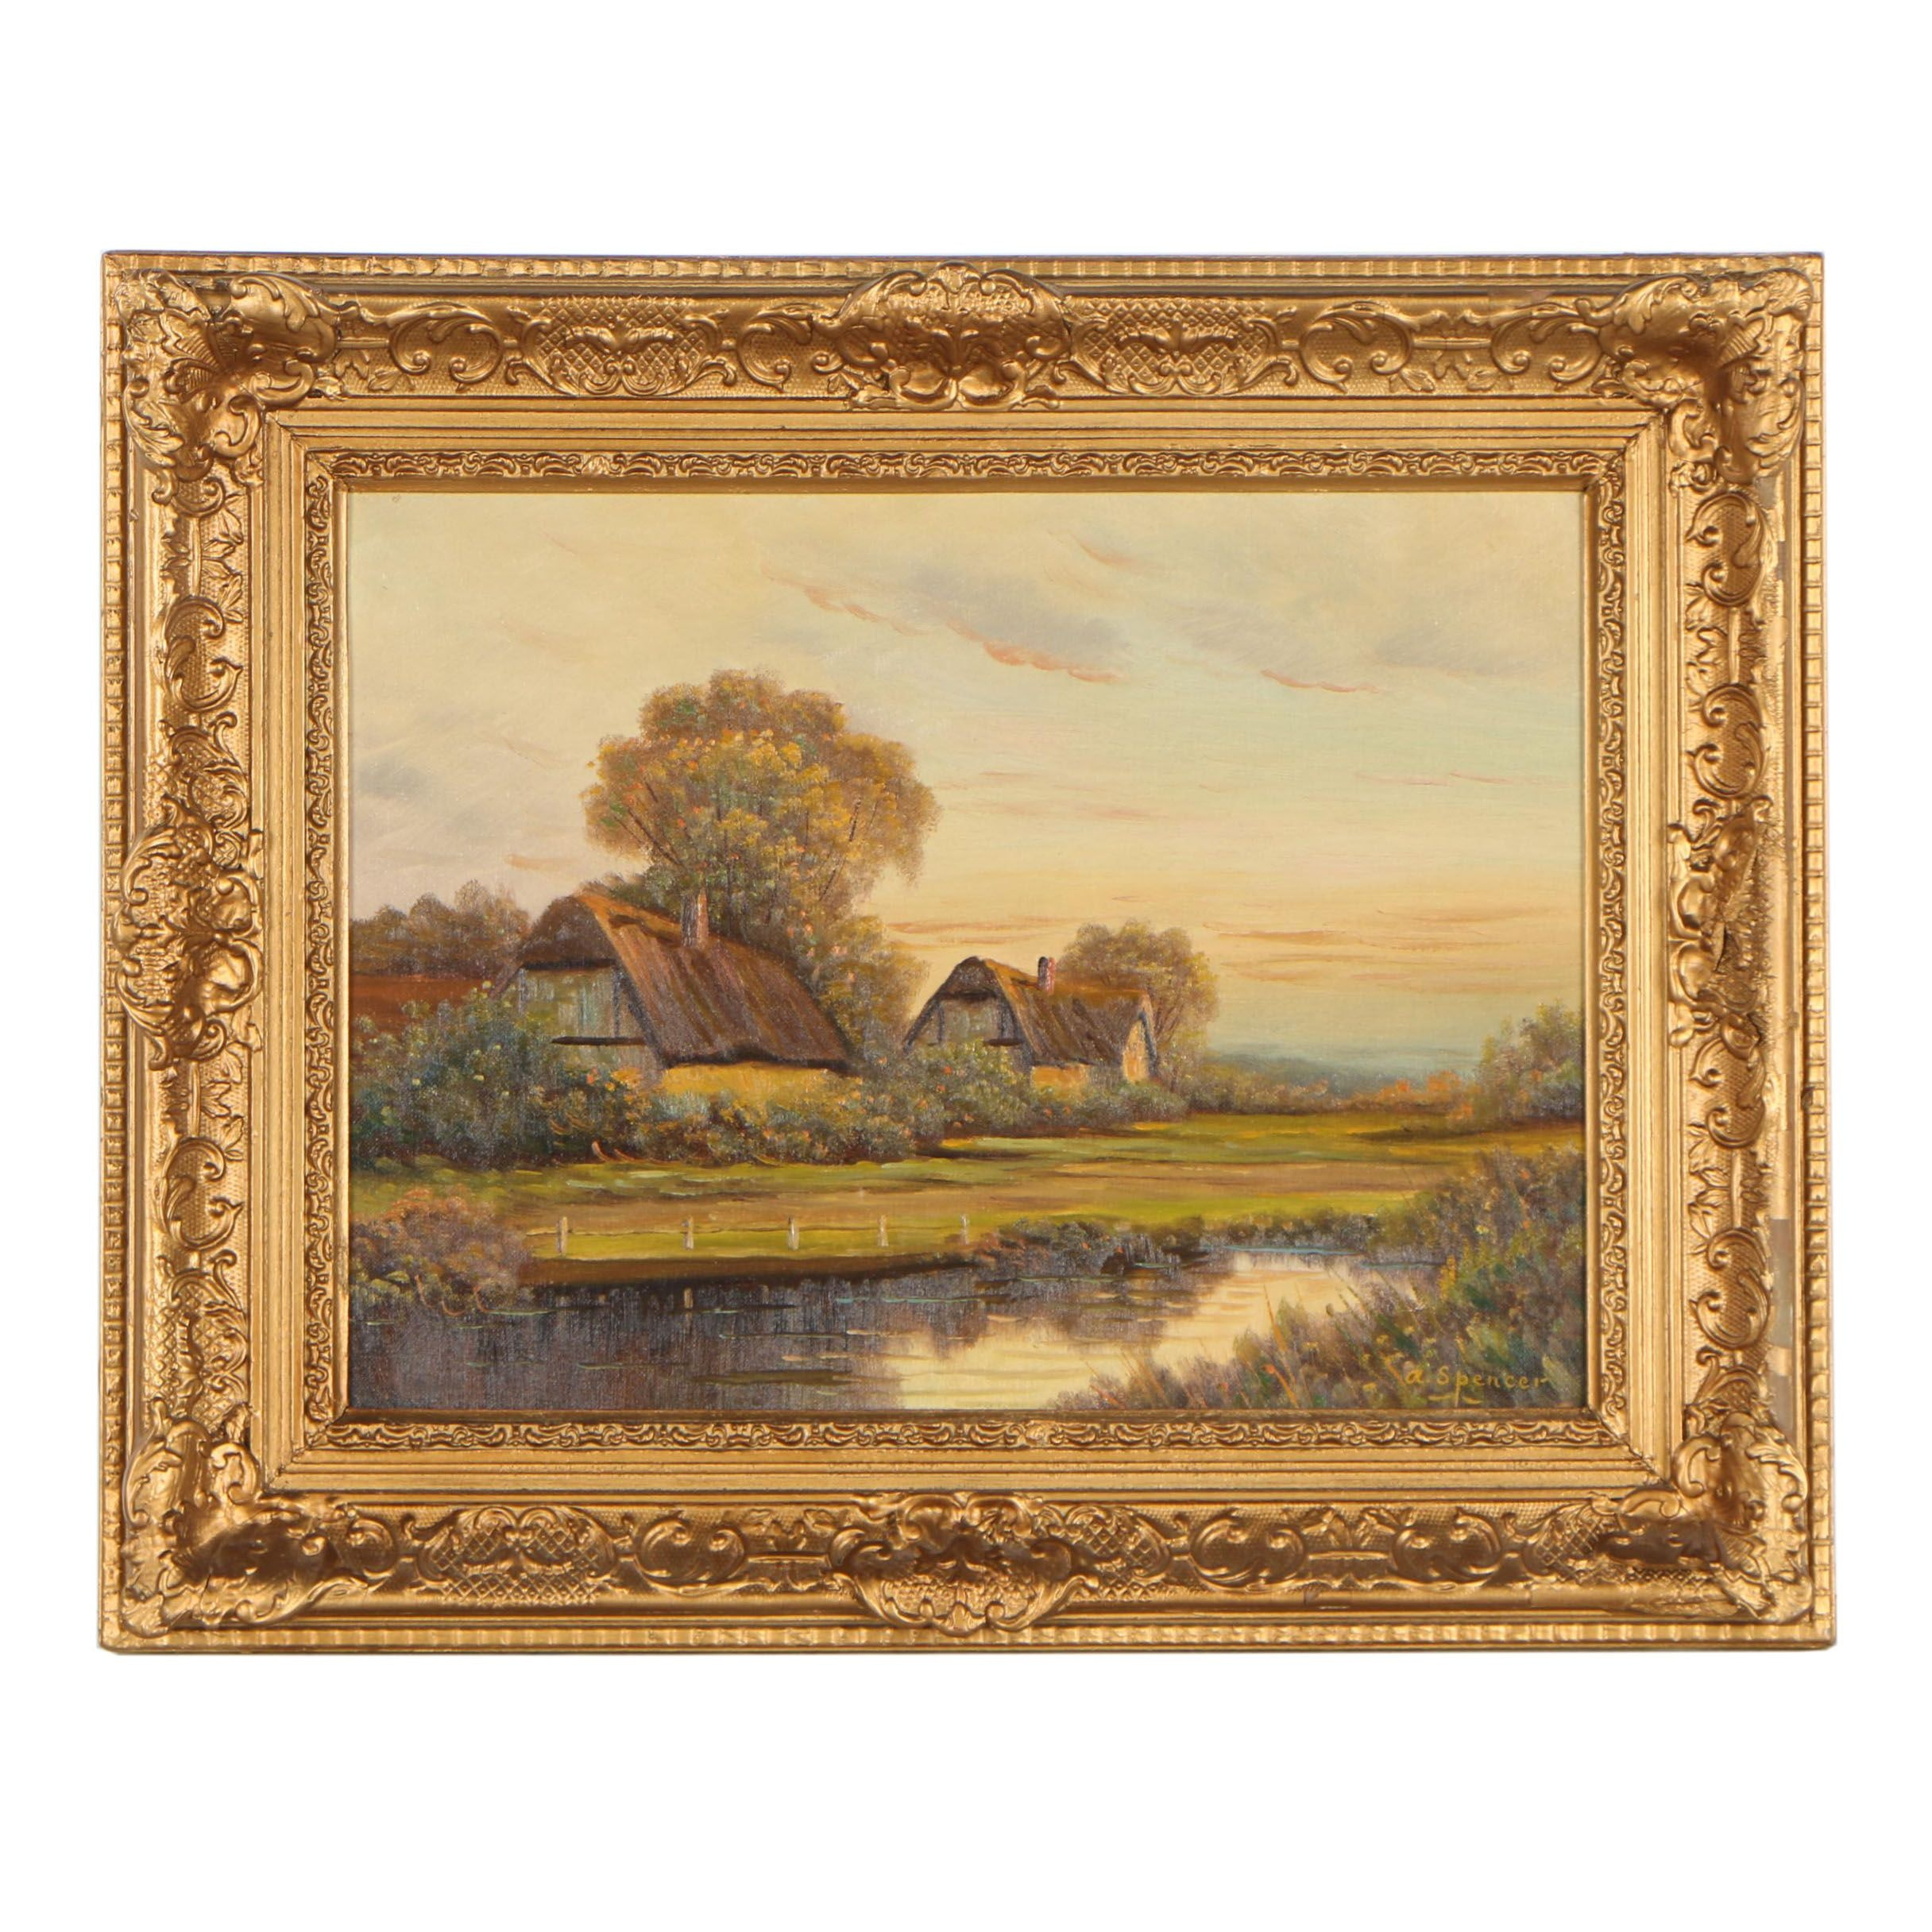 Augustus Spencer Oil Painting of Rural Landscape